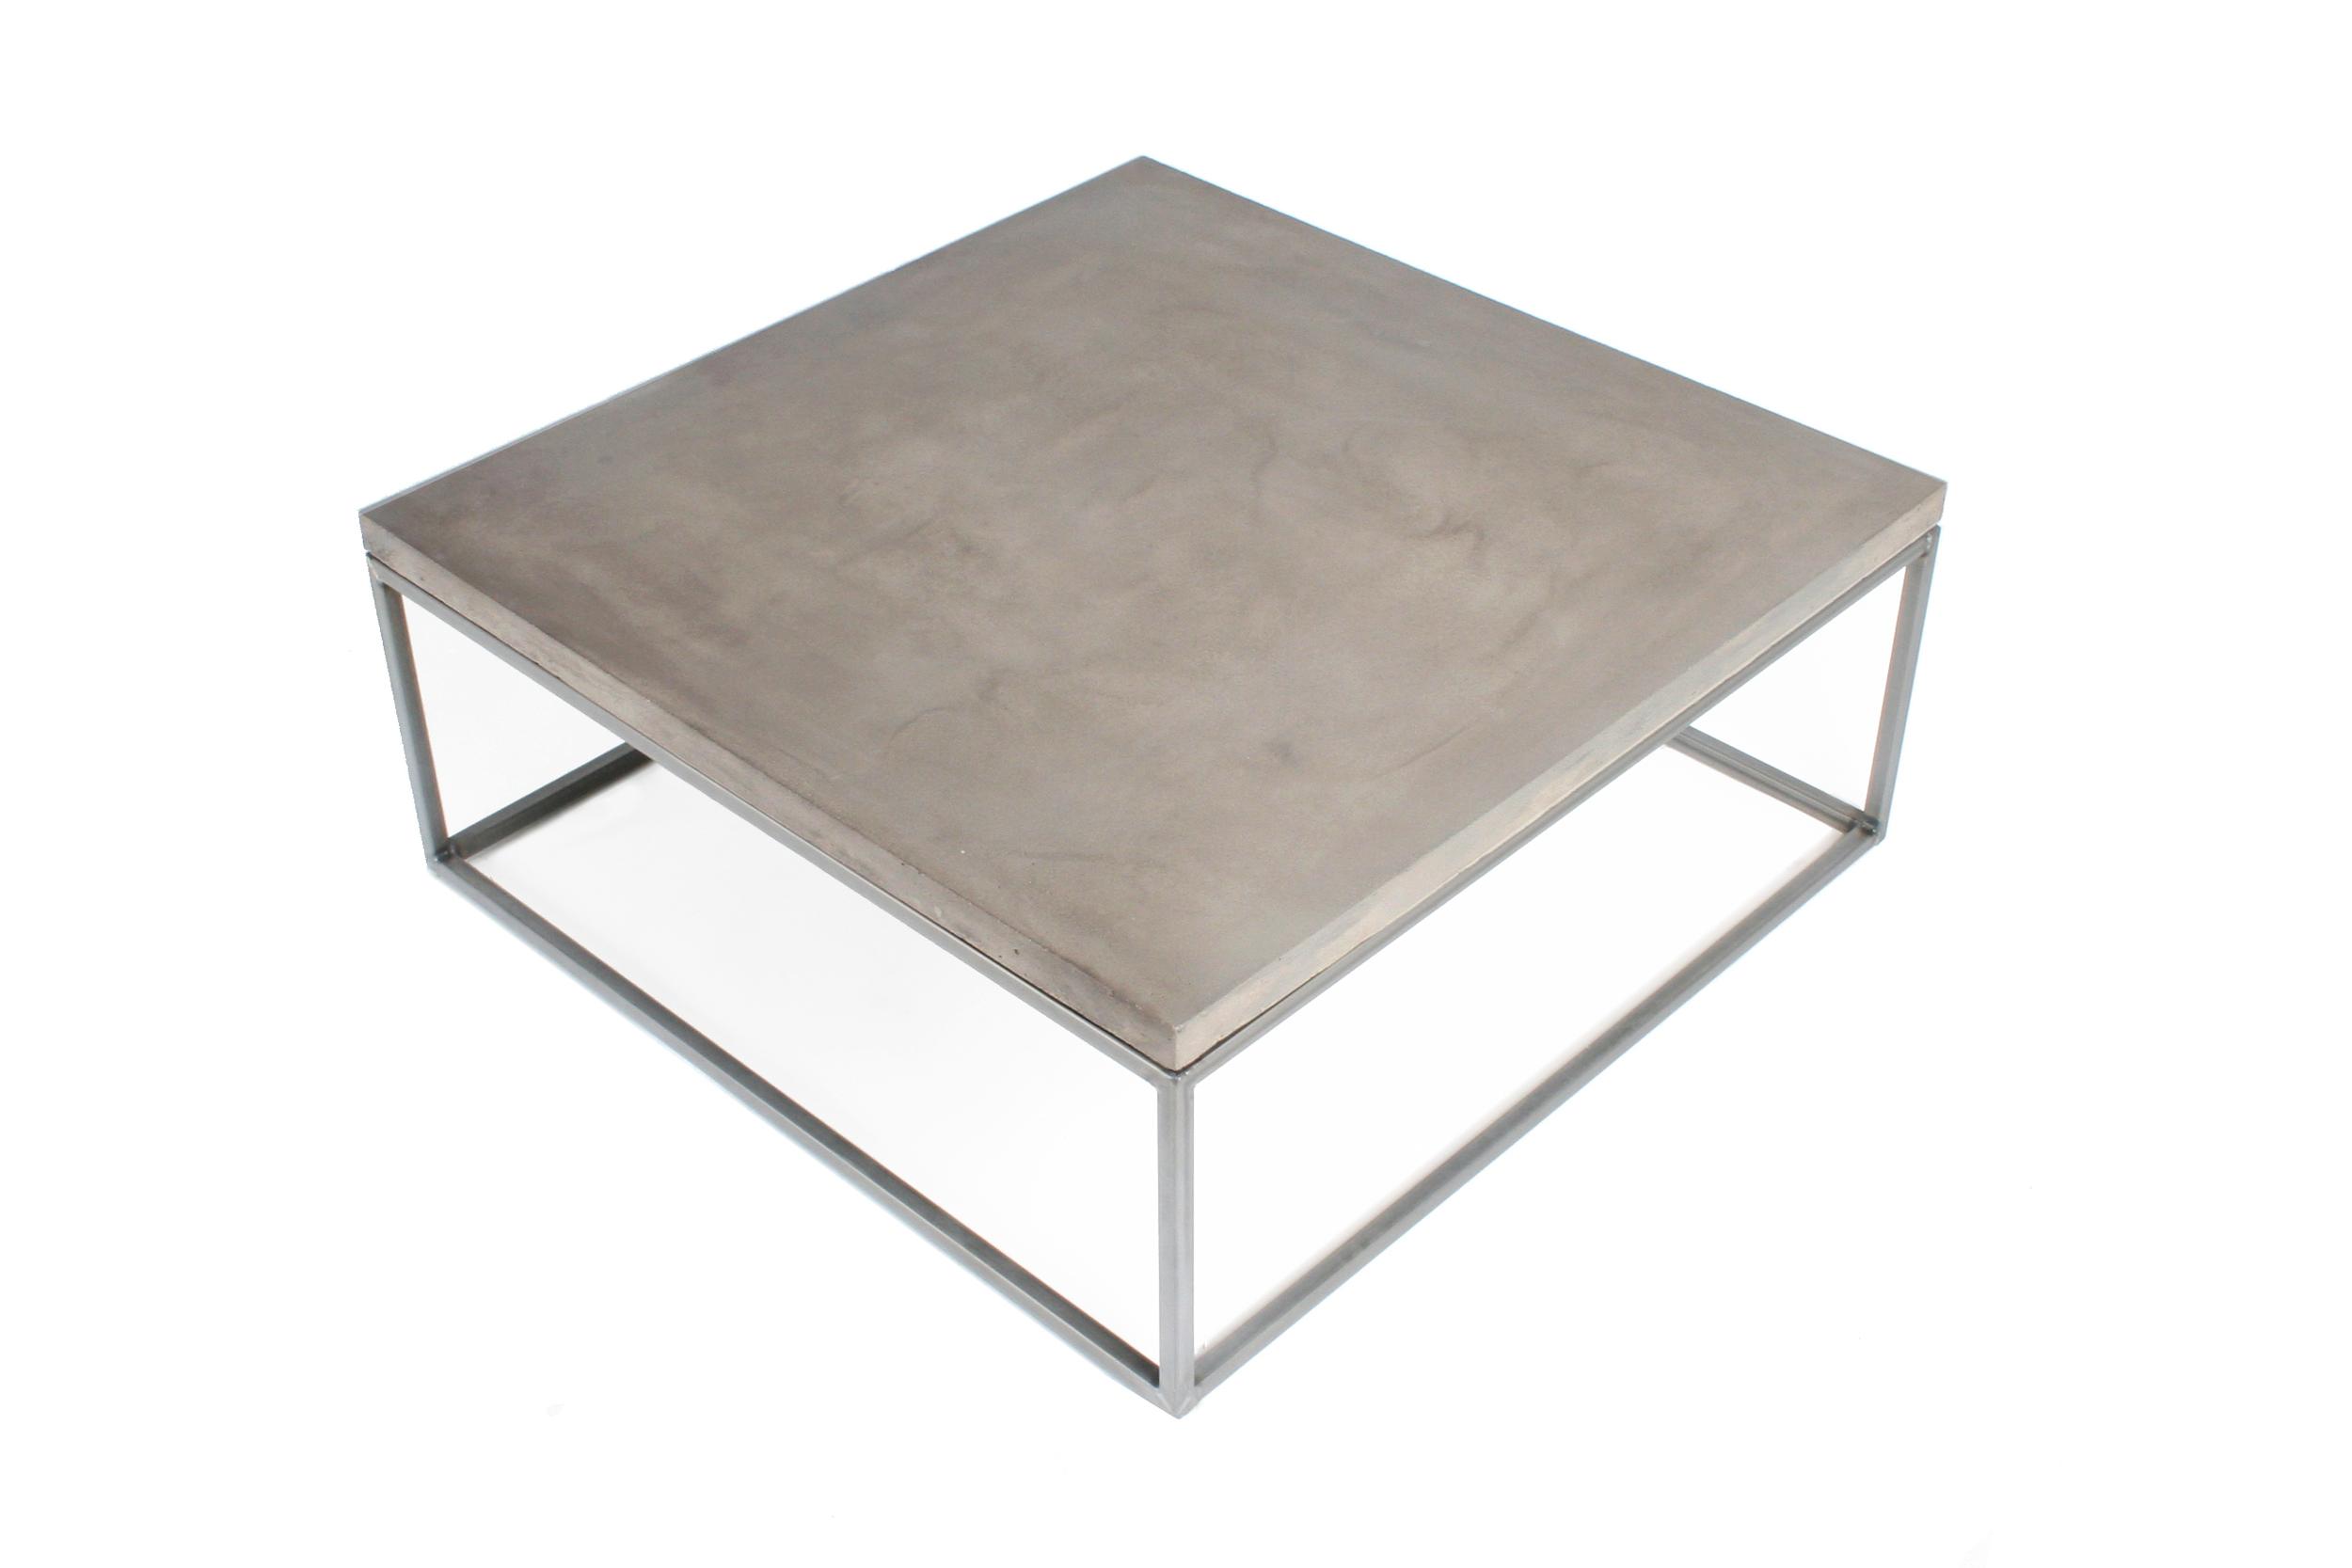 New Perspective Concrete Coffee Table Tin Design